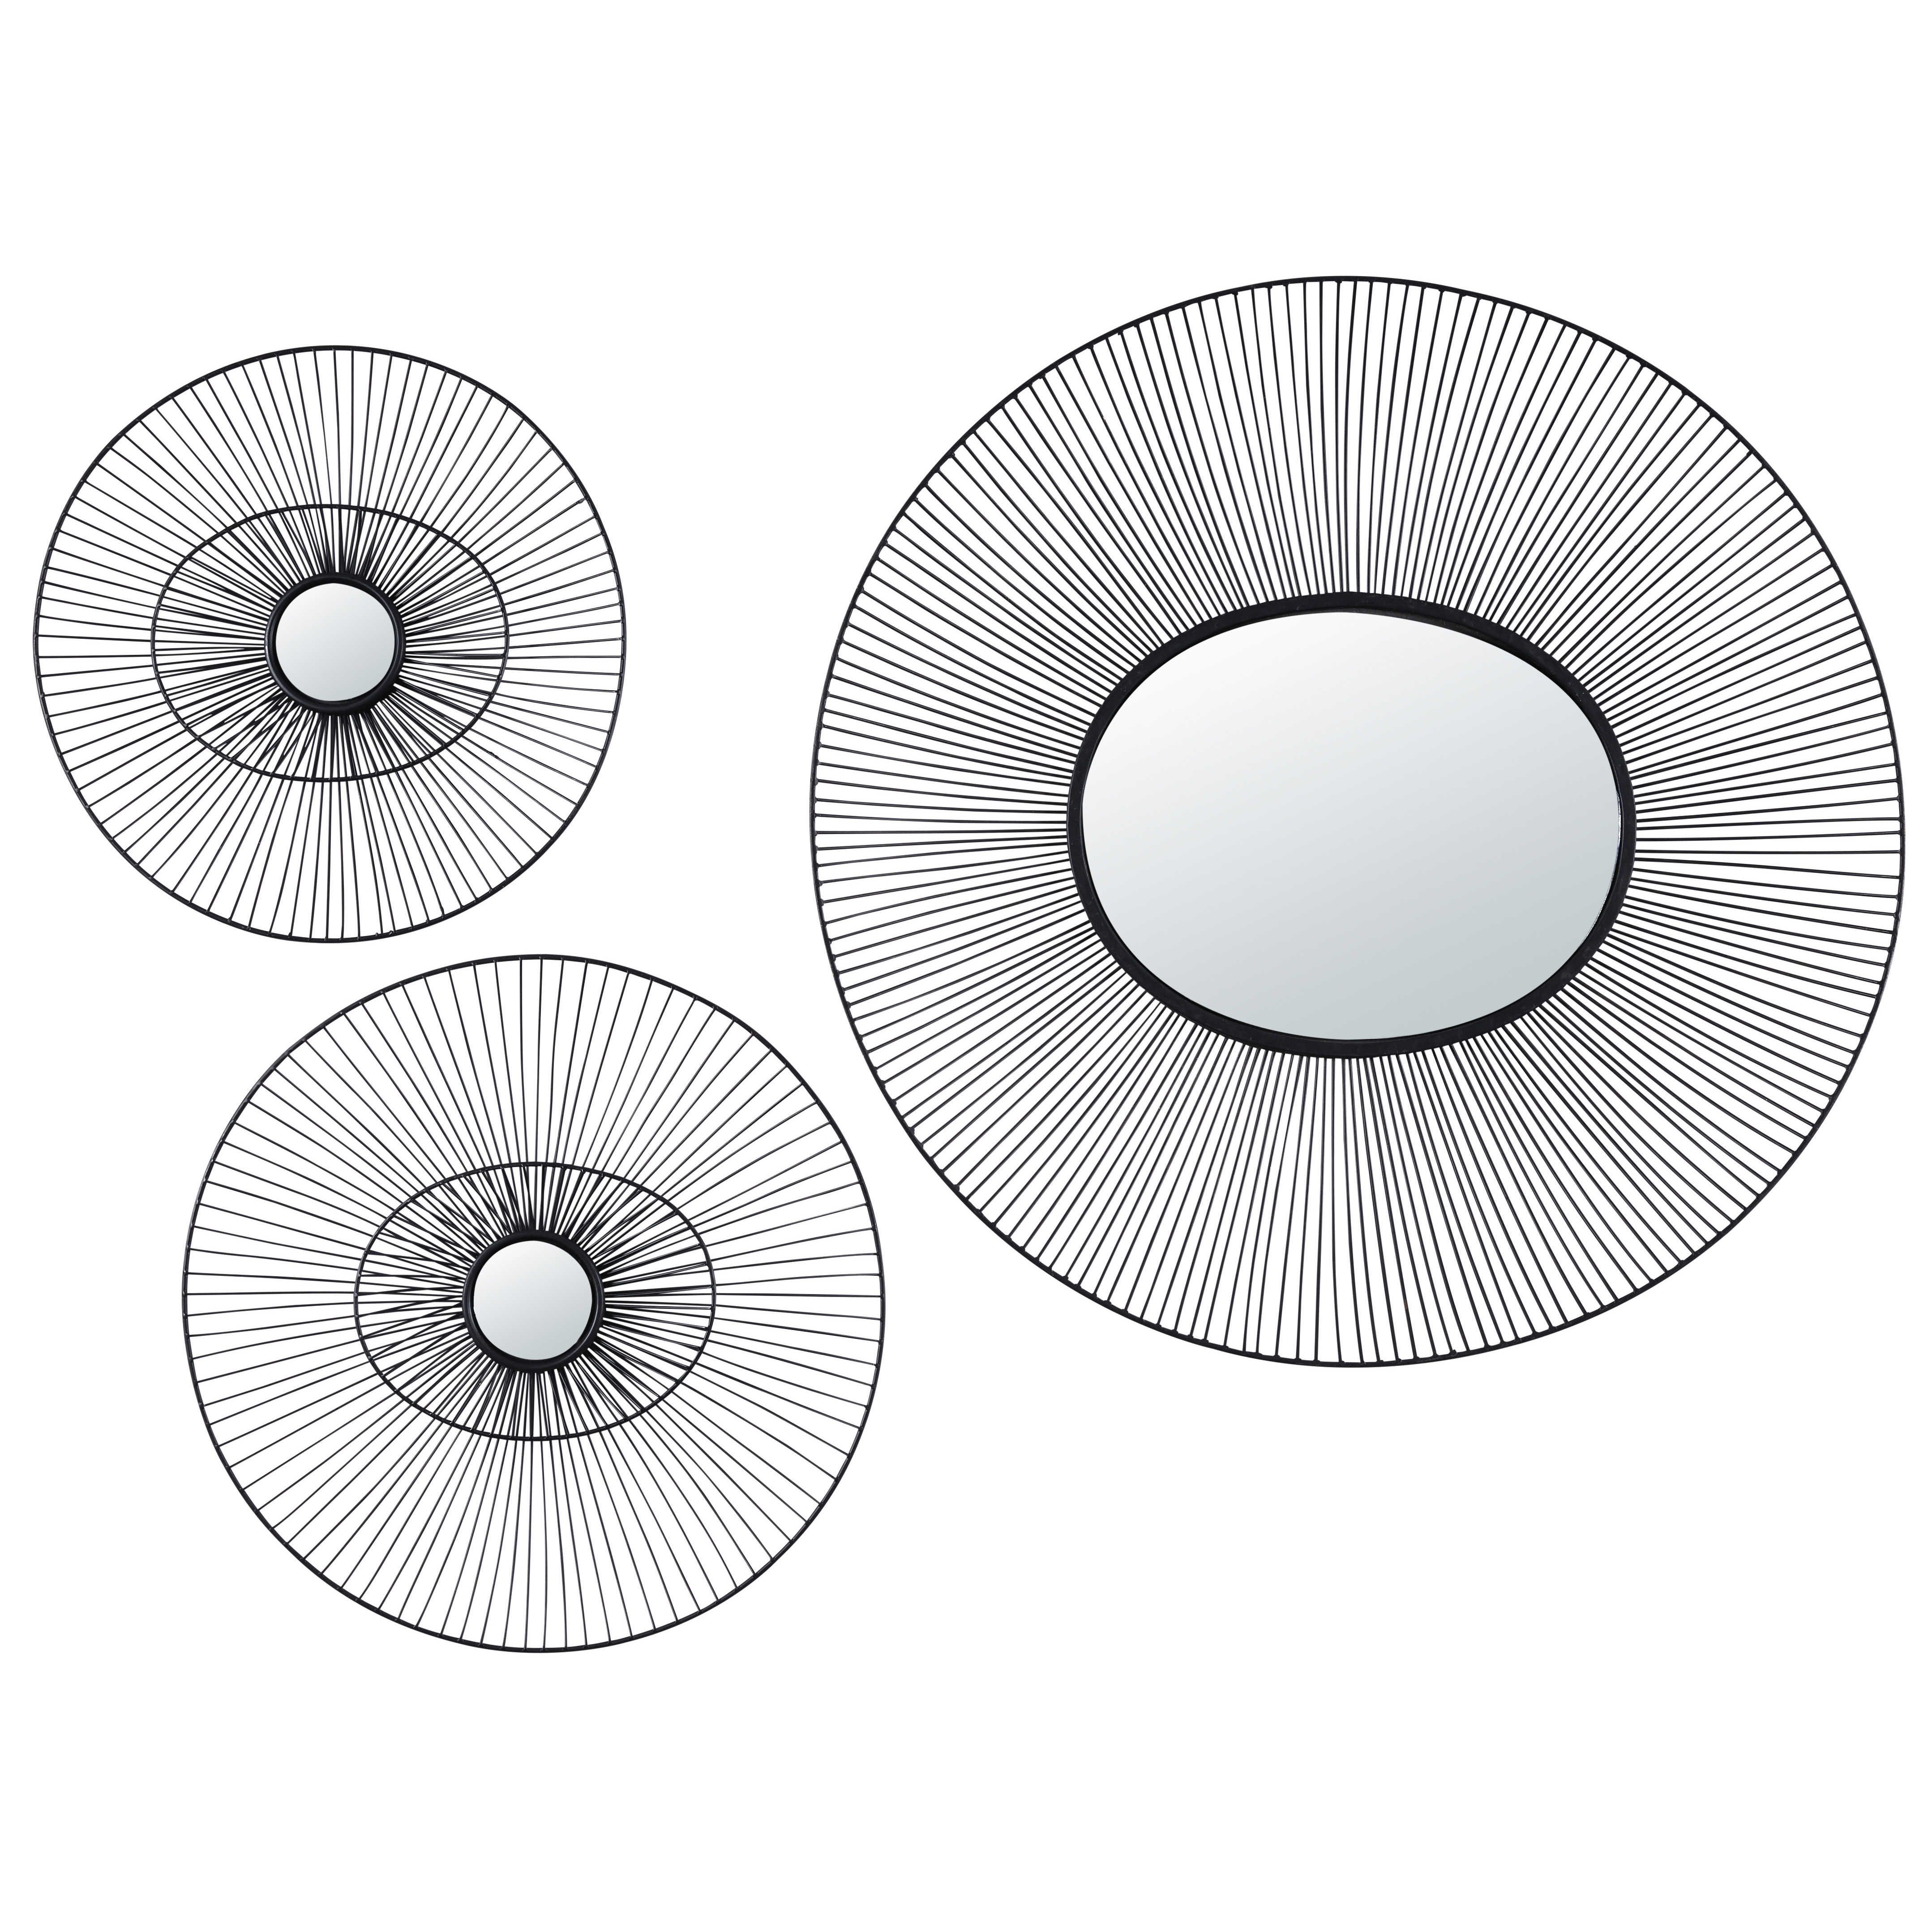 3 miroirs ronds en fil de m tal noir o b j e c t s d e c. Black Bedroom Furniture Sets. Home Design Ideas